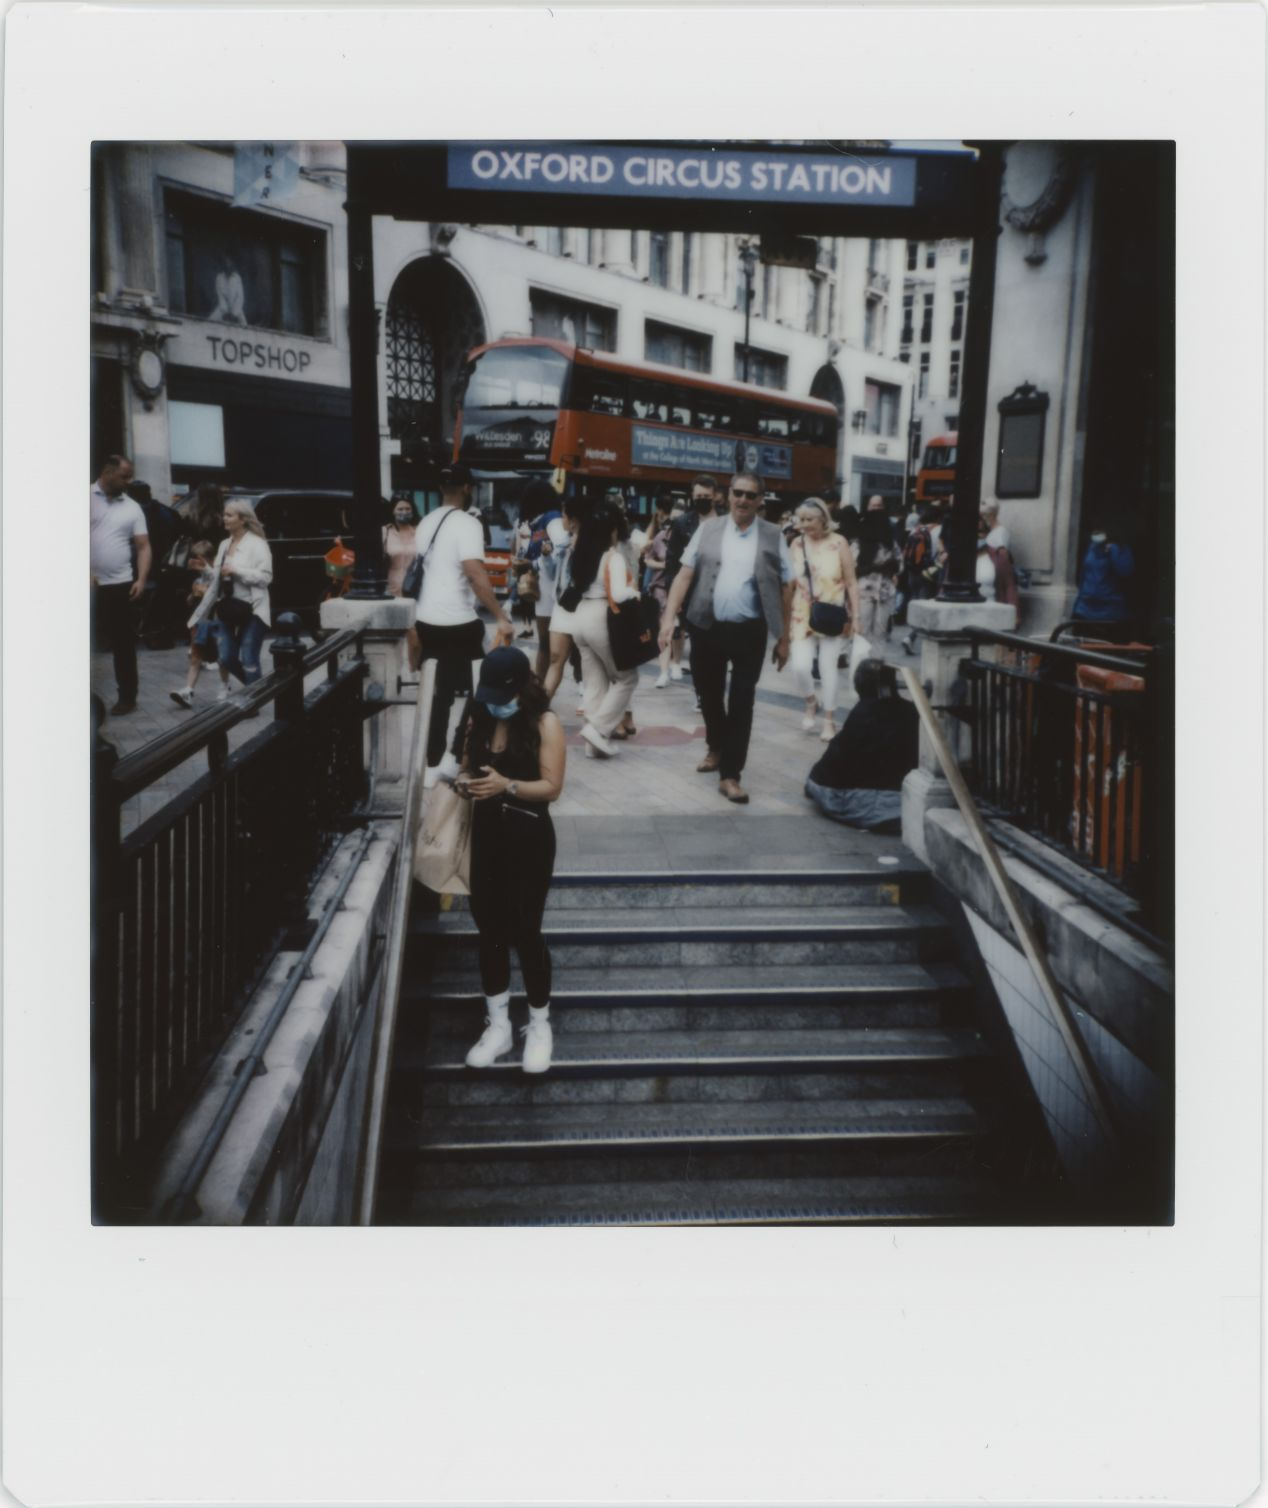 Photograph 18: Oxford Circus Underground Station.